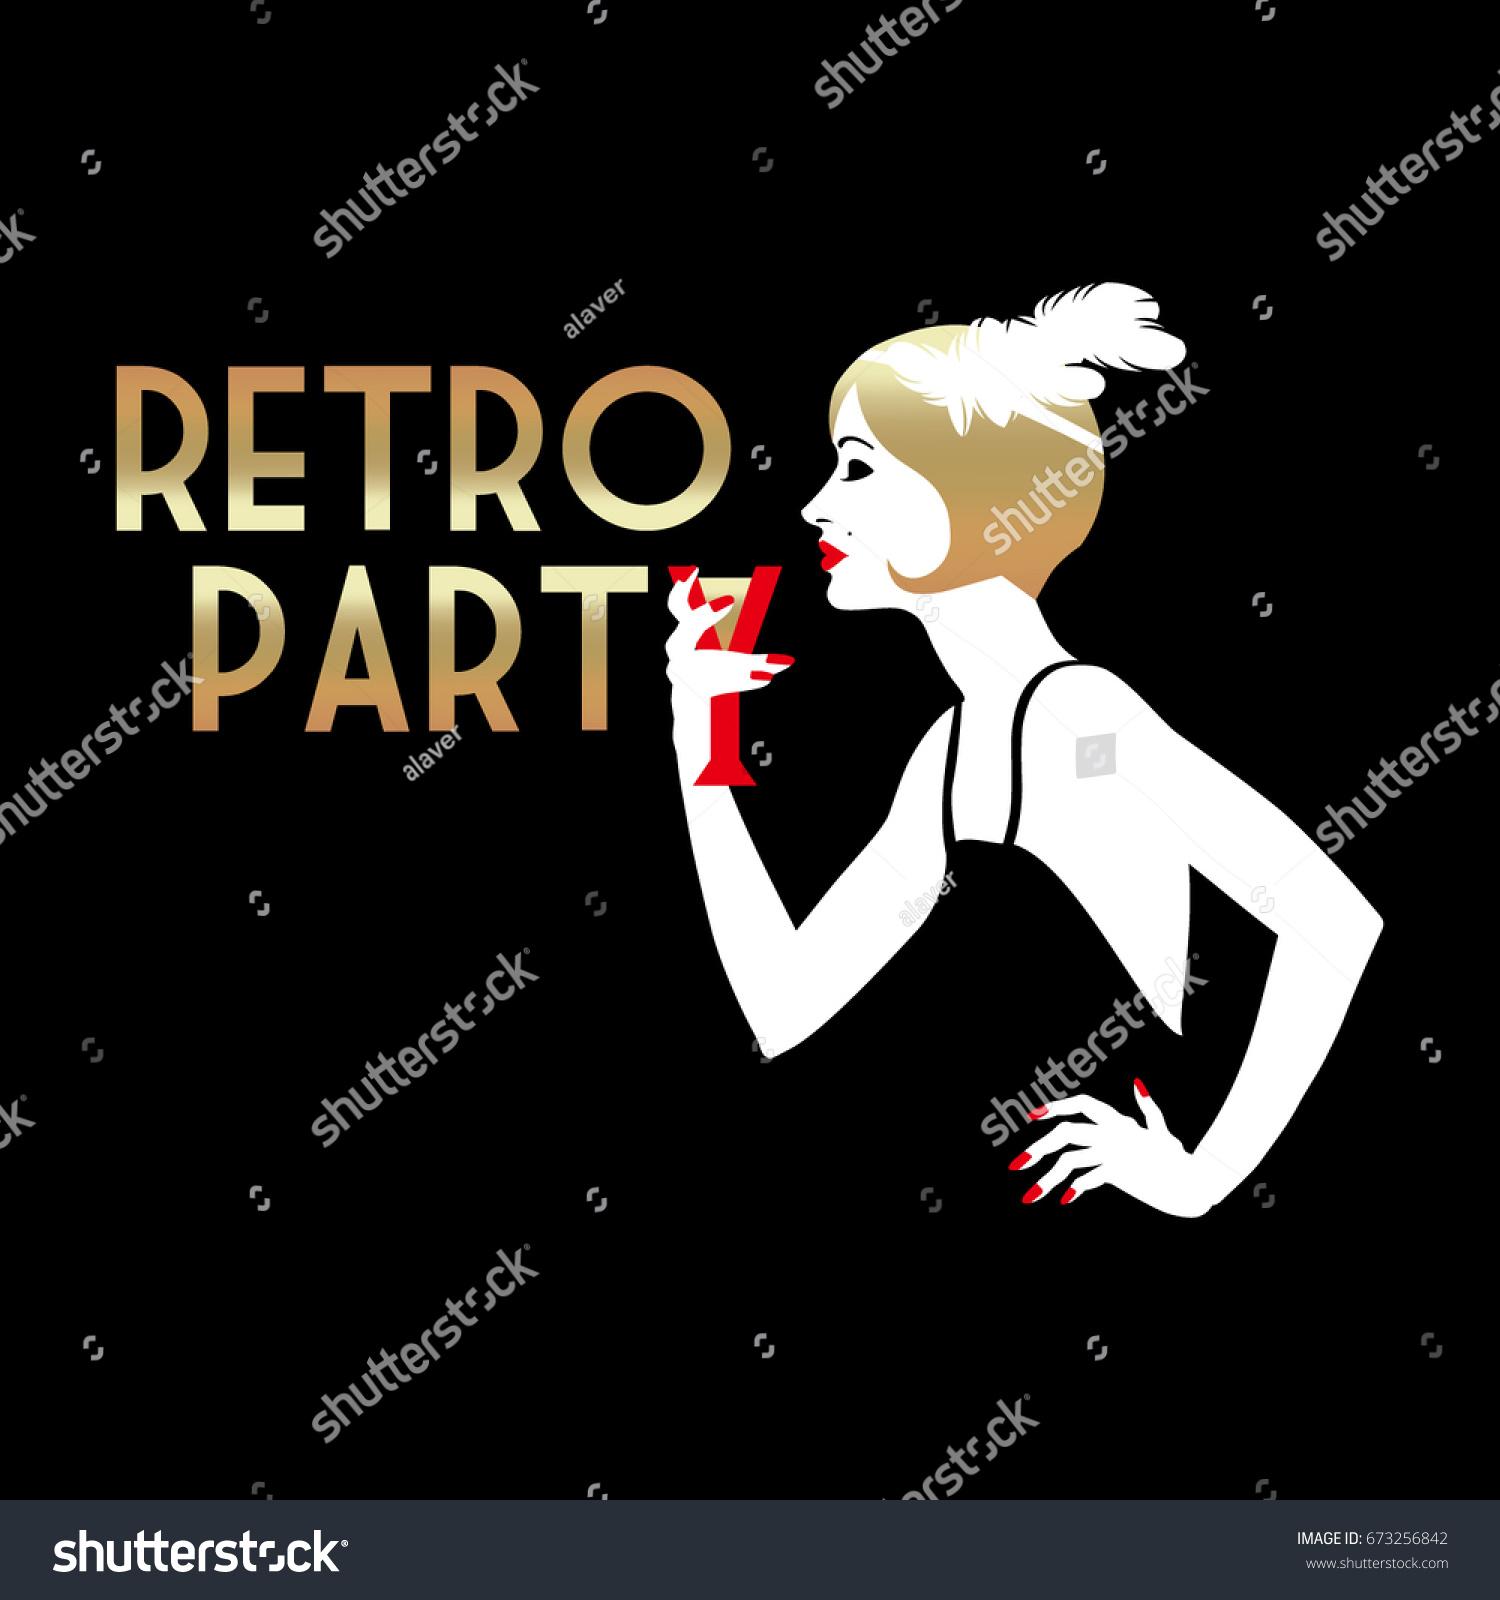 Retro Party Invitation Card Handmade Drawing Stock Vector ...